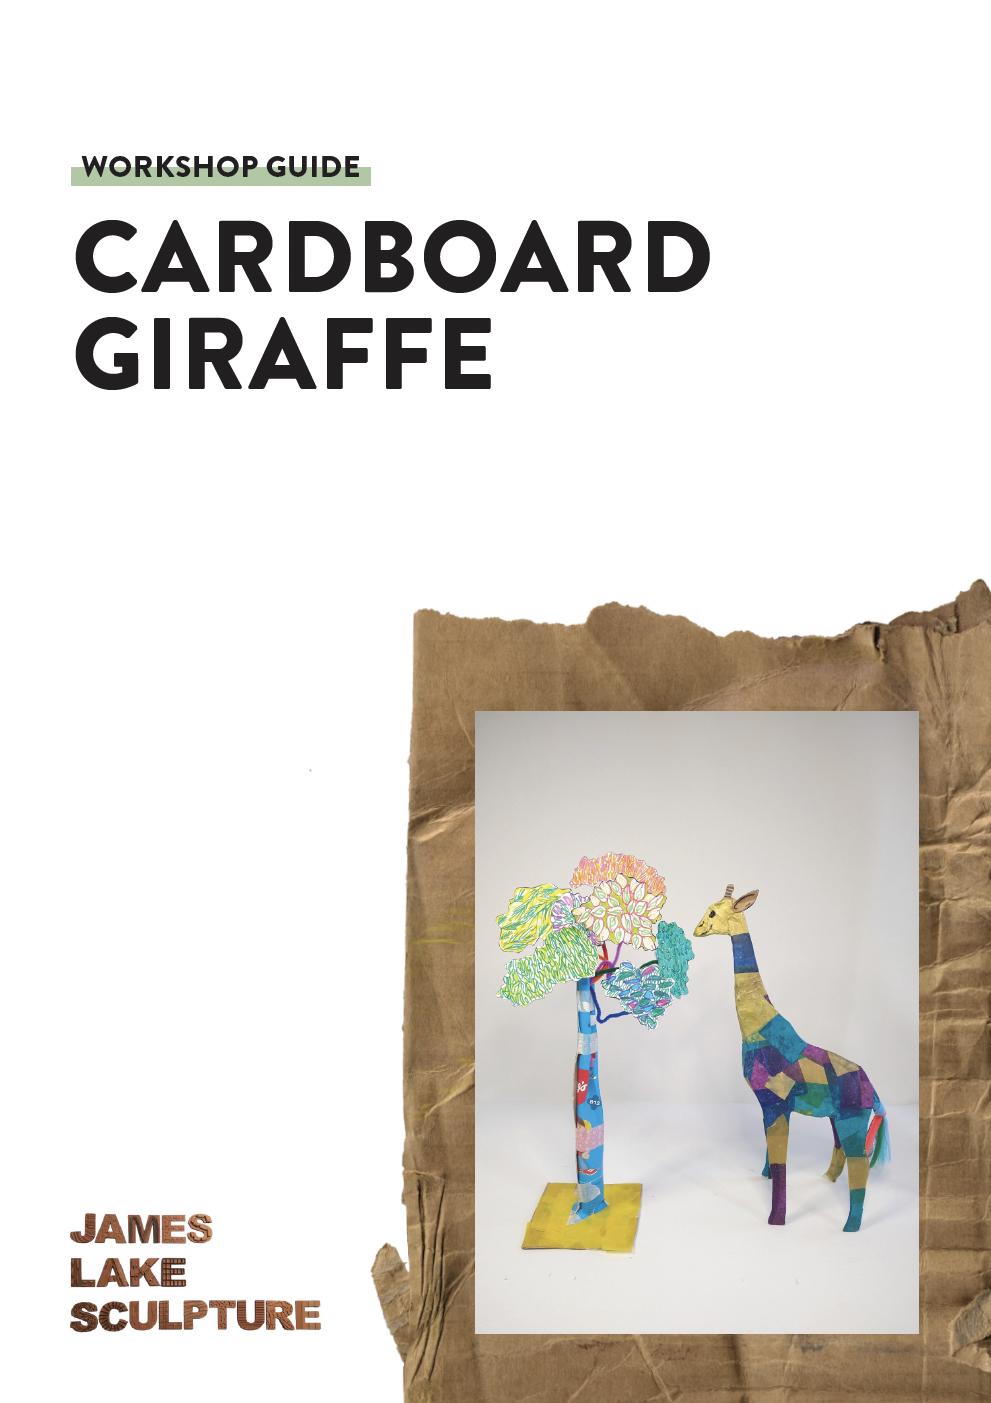 giraffe cover - James Lake